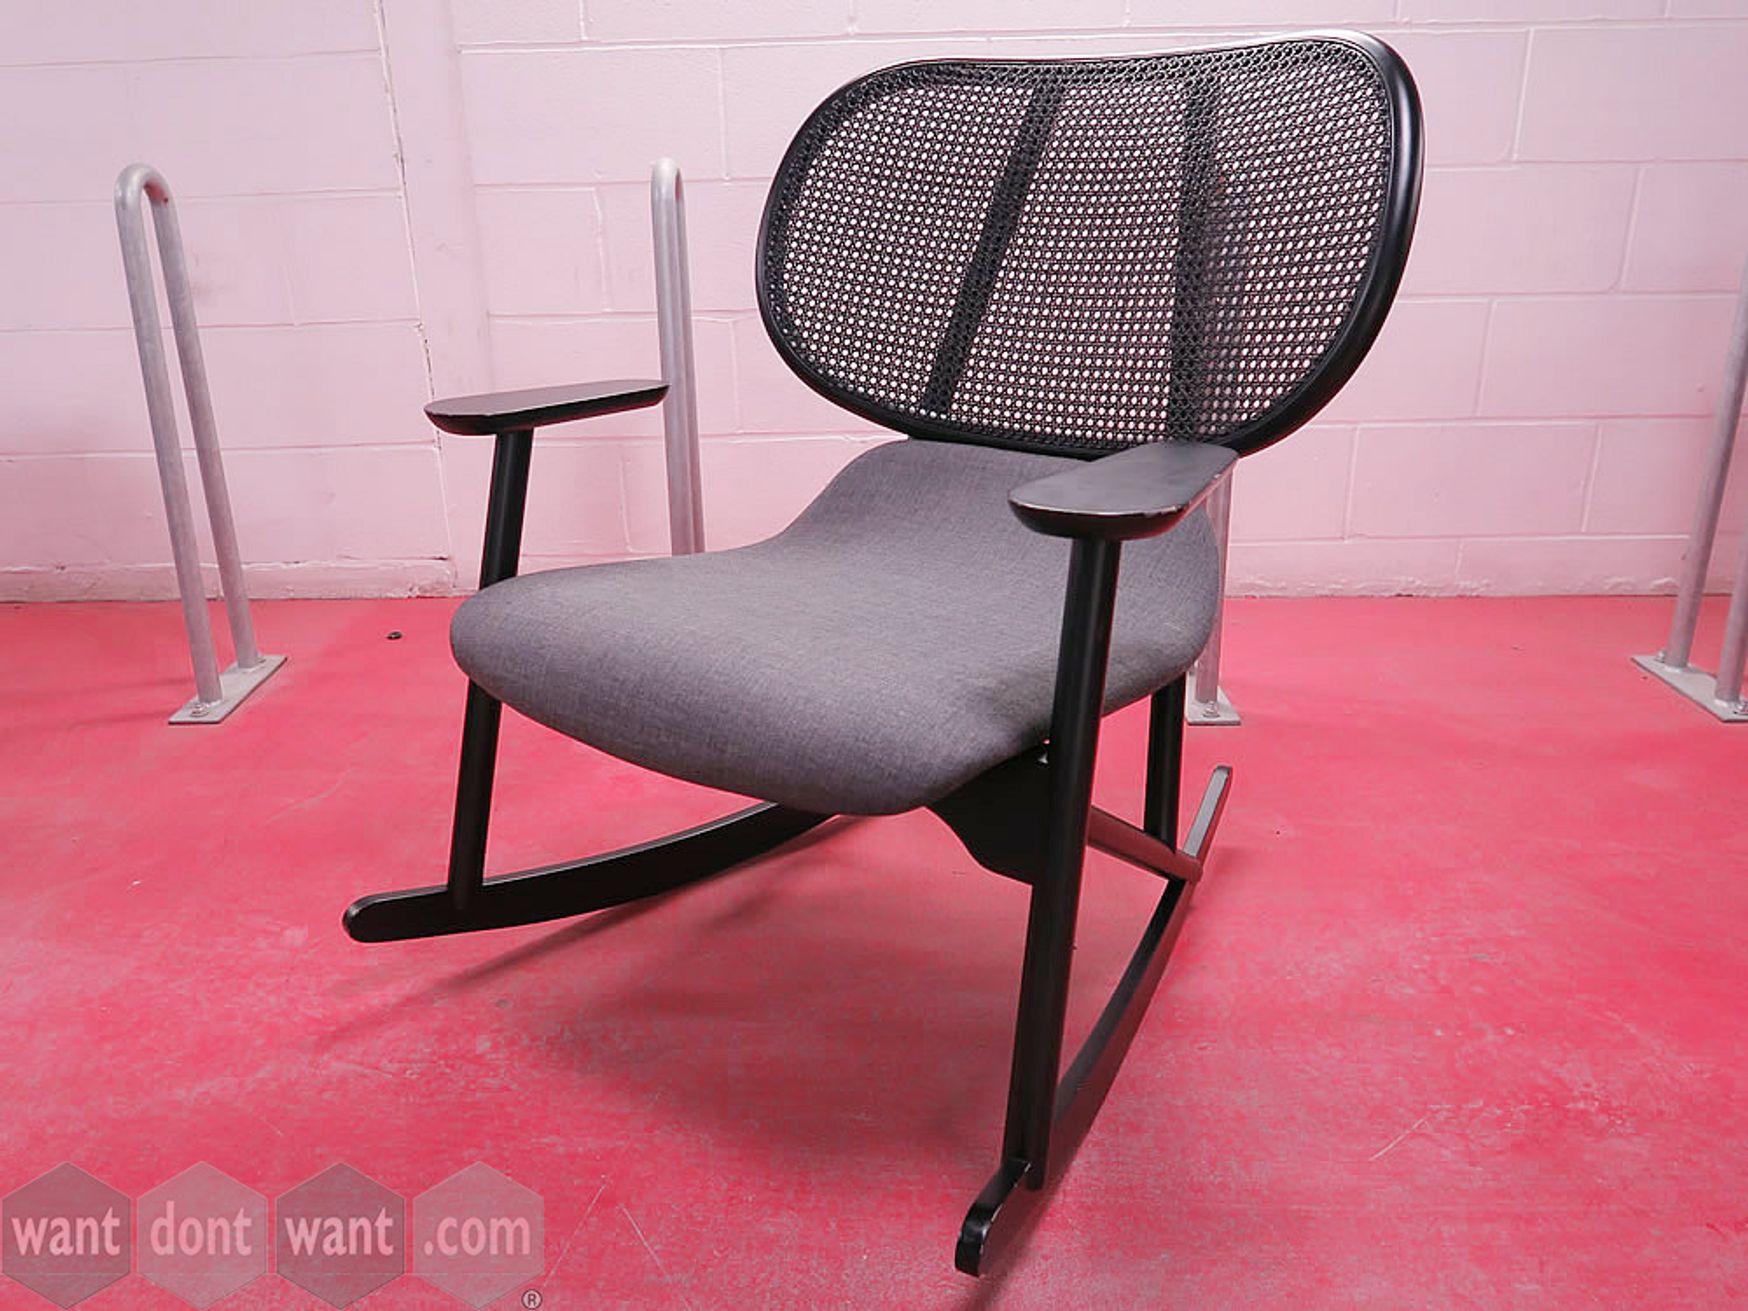 Fabulous used Moroso 'Klara' rocking chair with grey upholstered seat